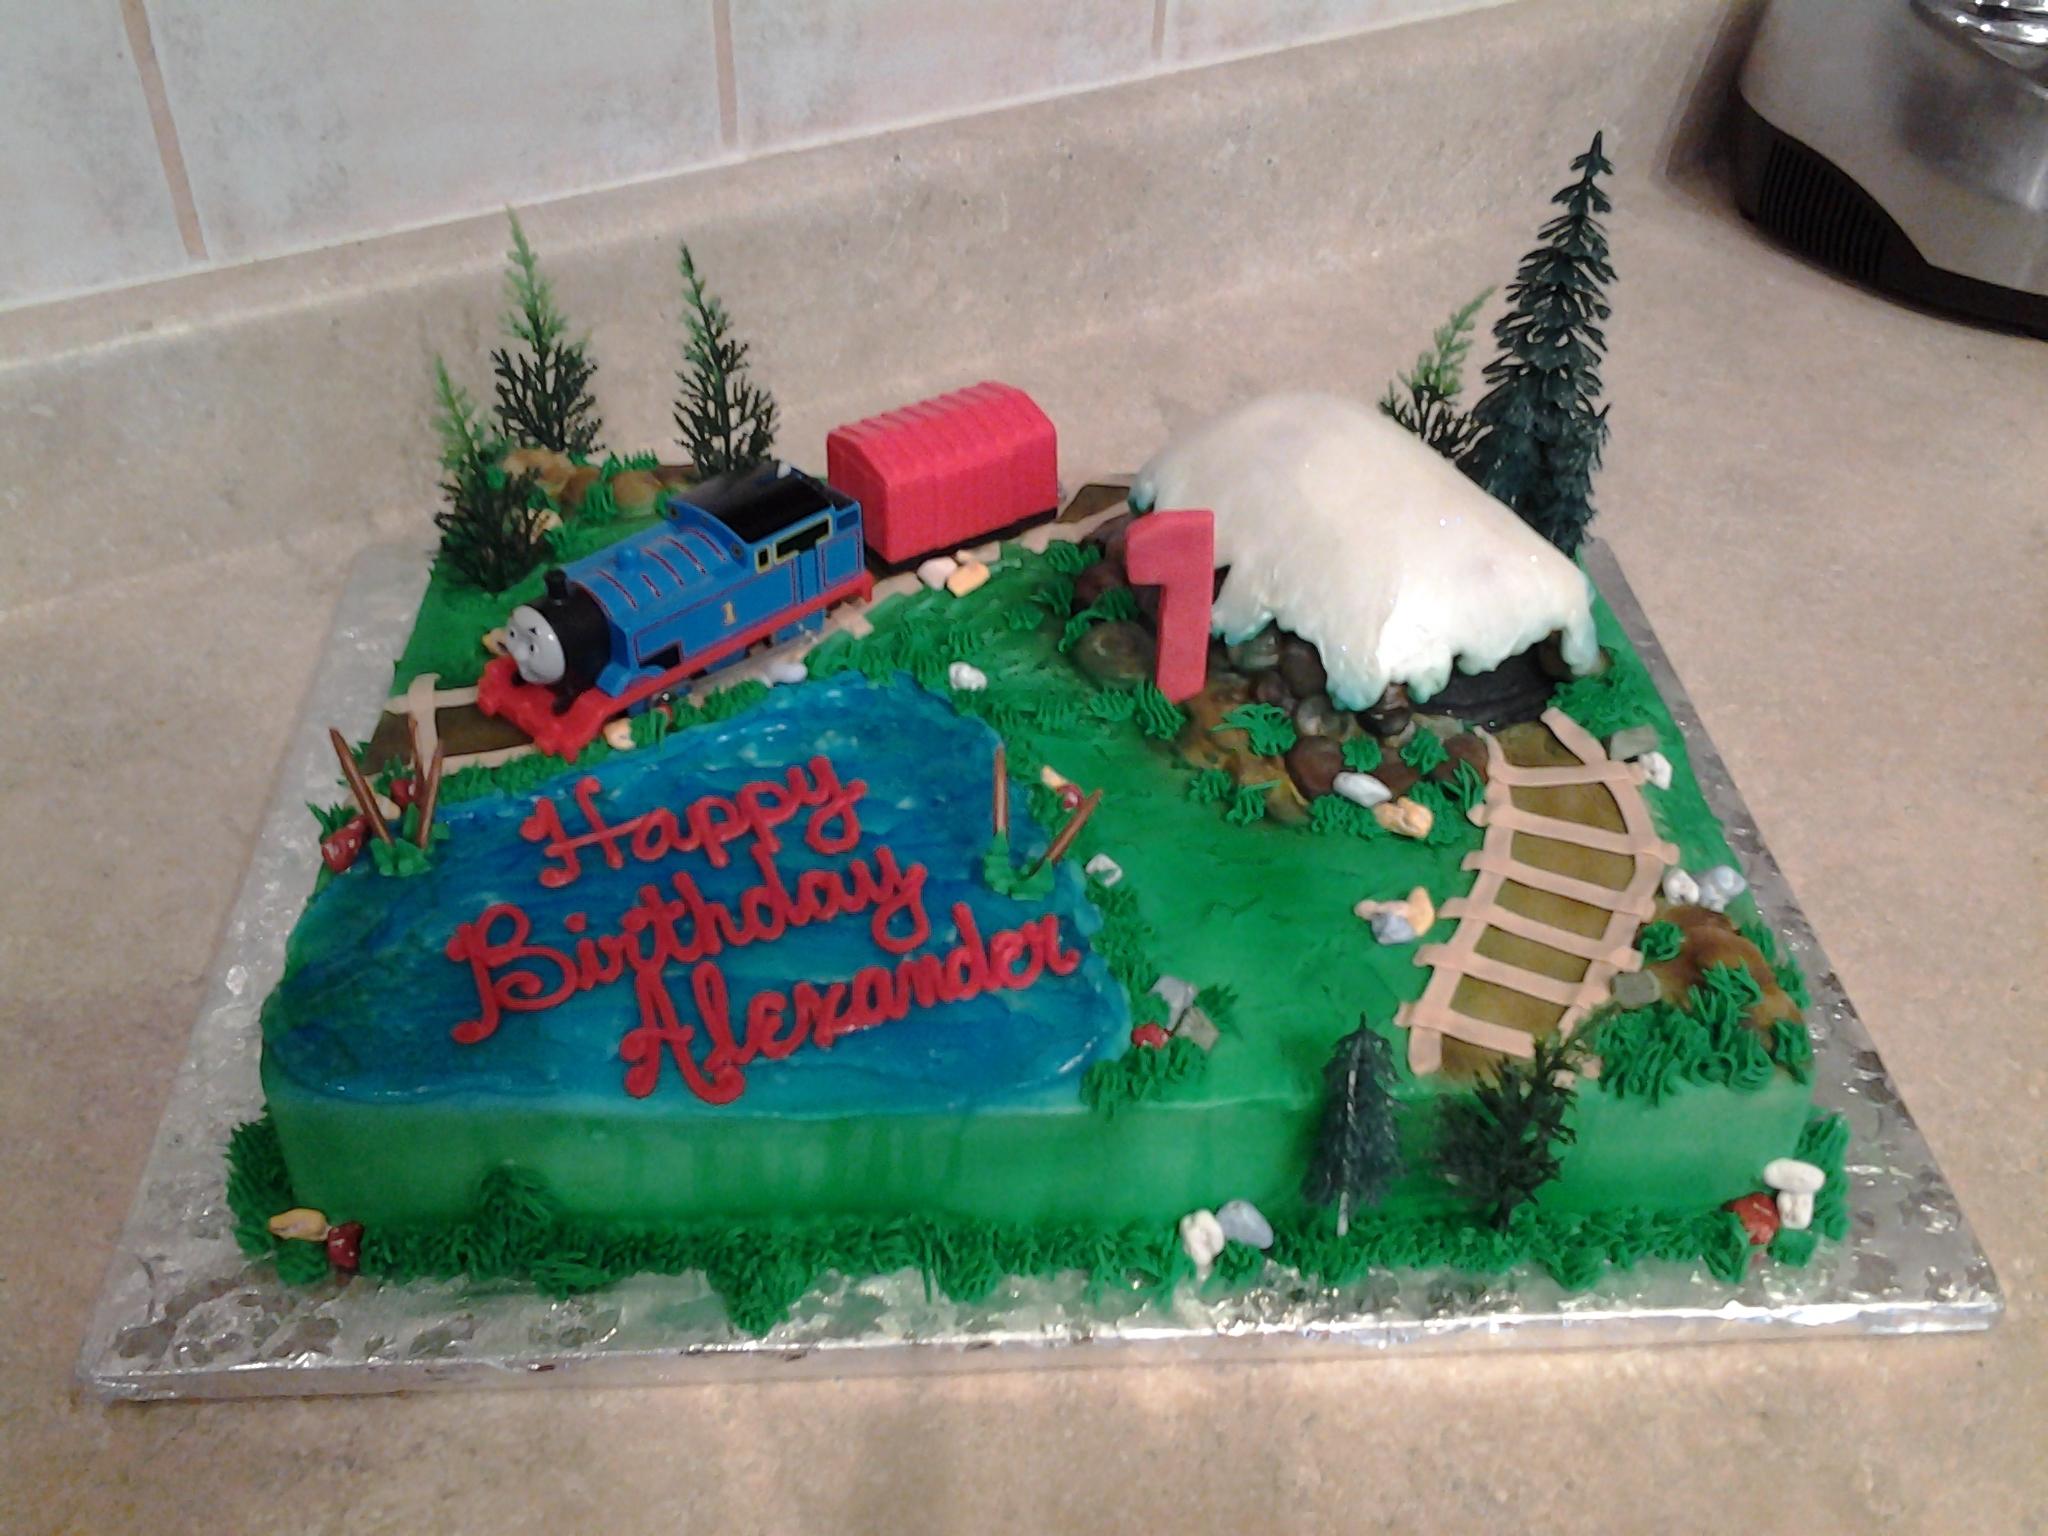 Train theme sheet cake